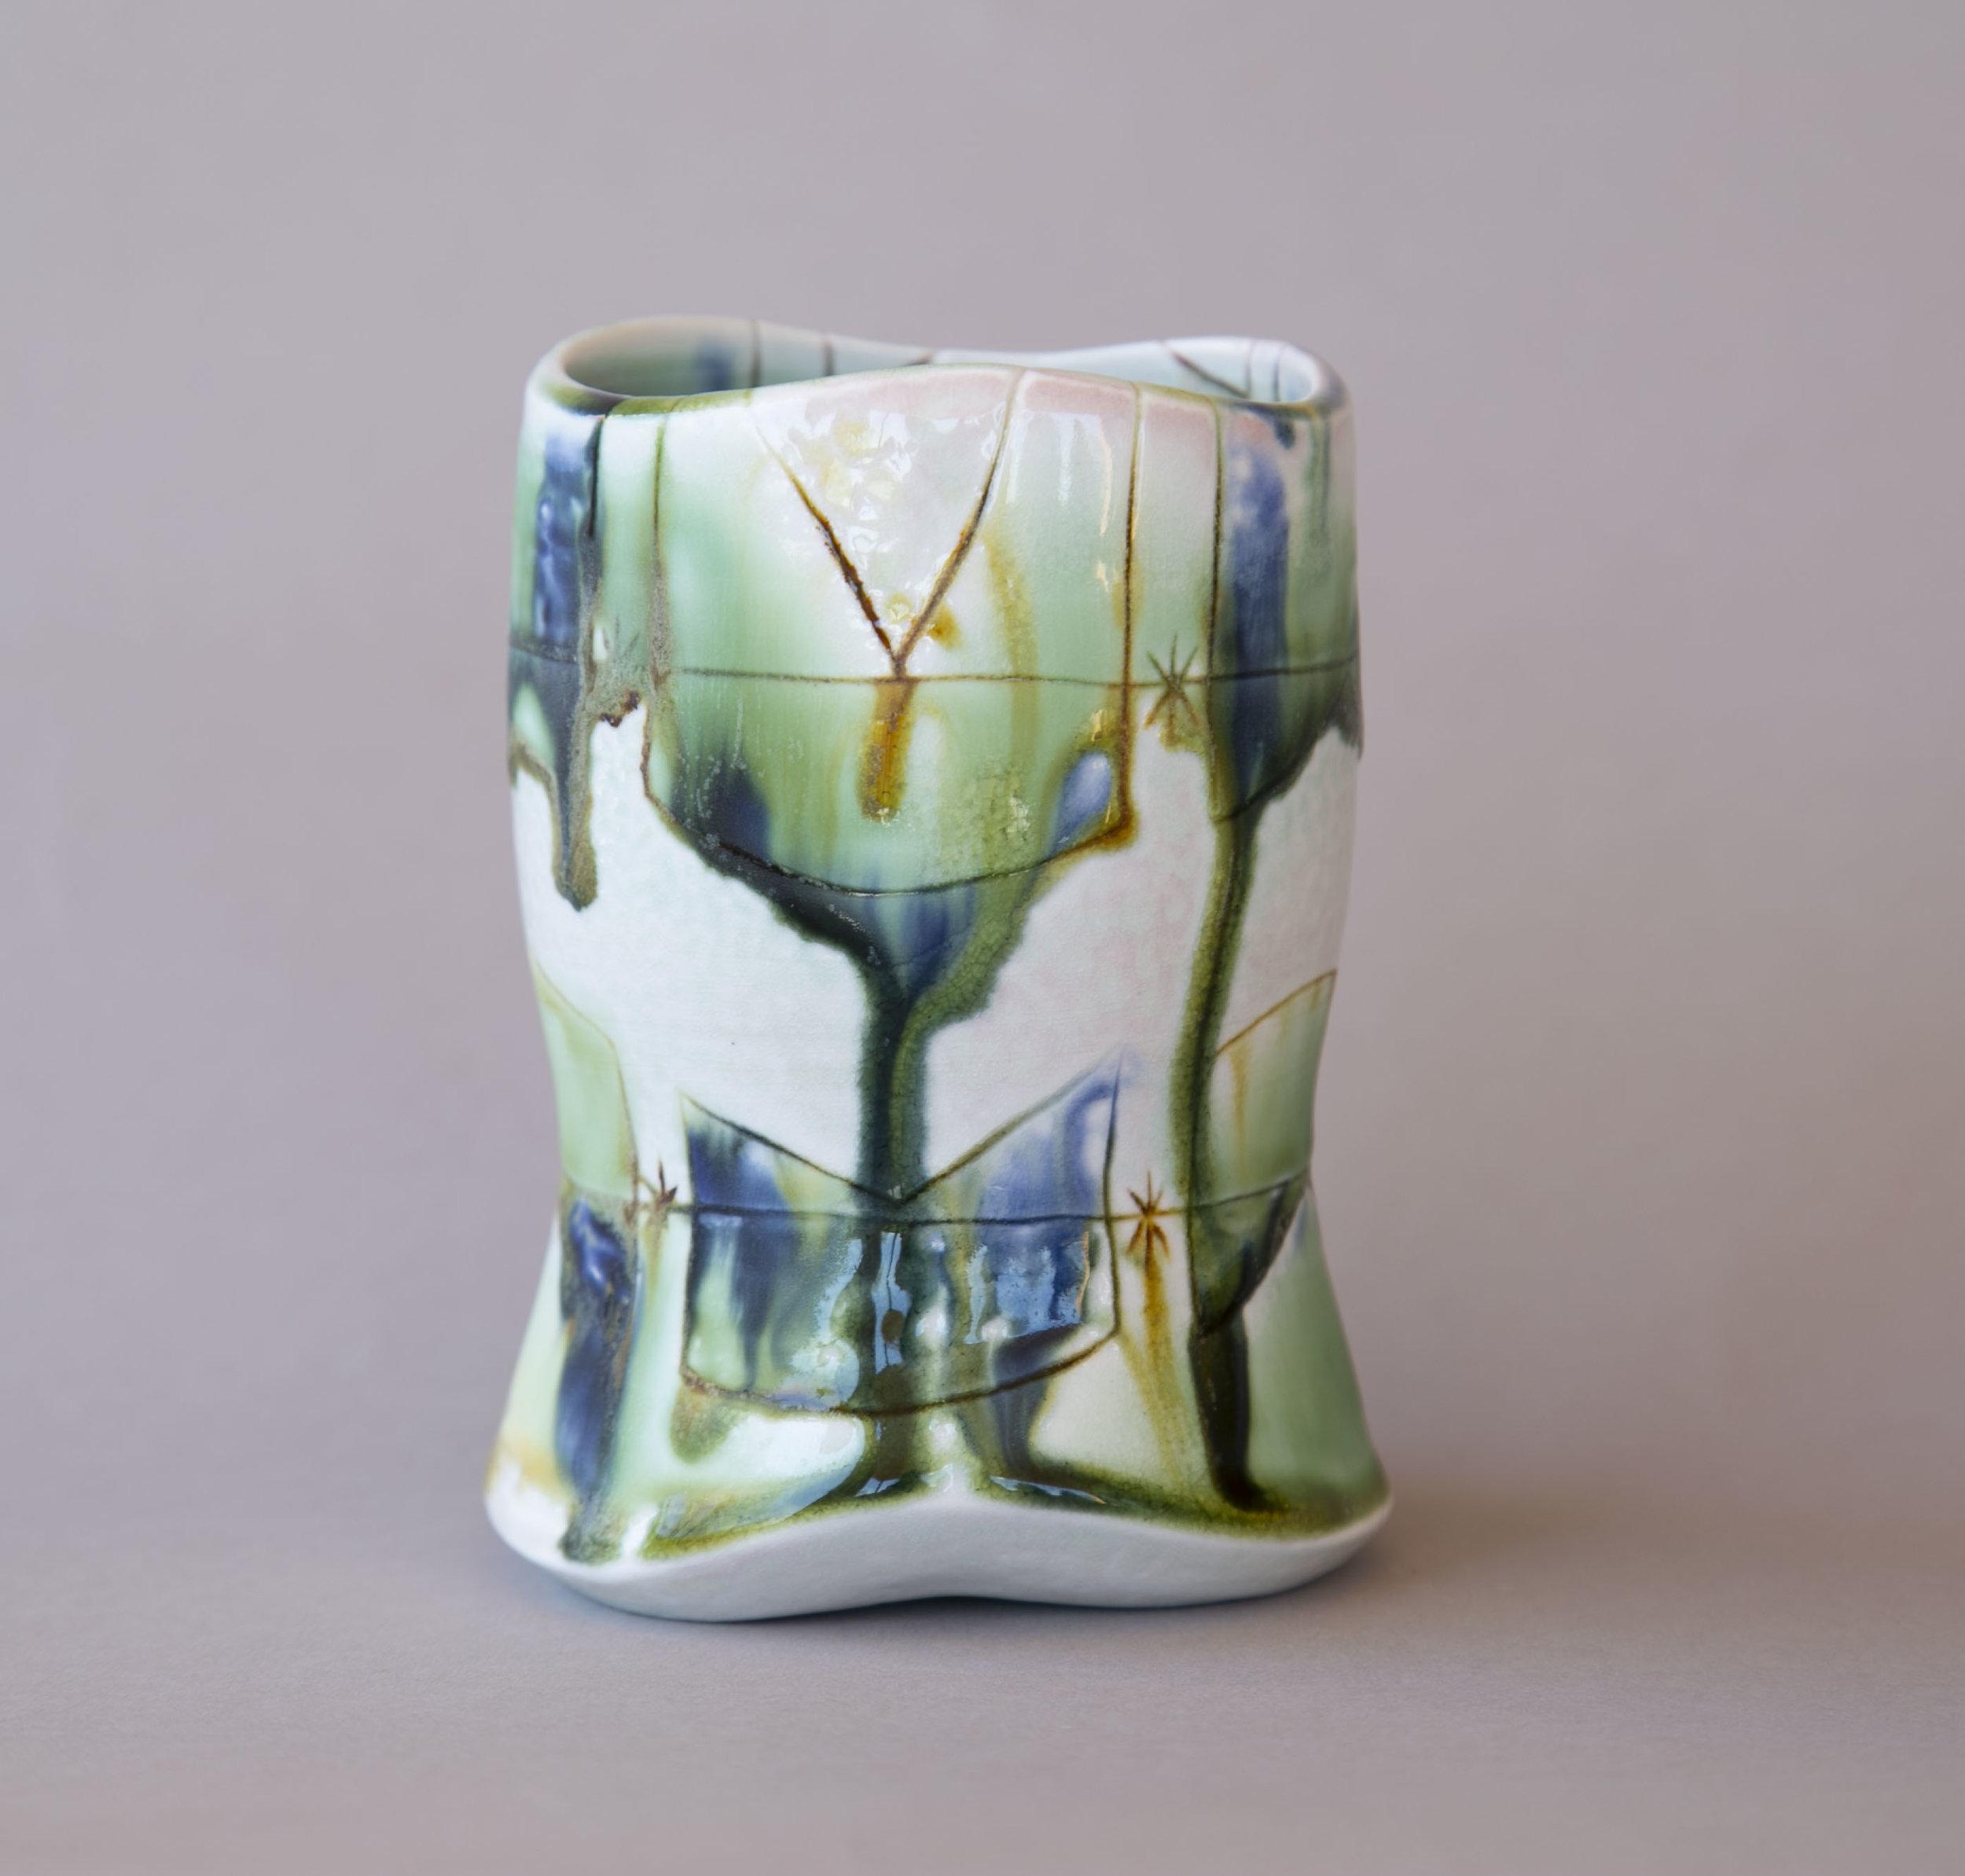 Bannerot, Julia, Tumbler, Cone 10 soda fired porcelain, $60, 719-213-8764.jpg